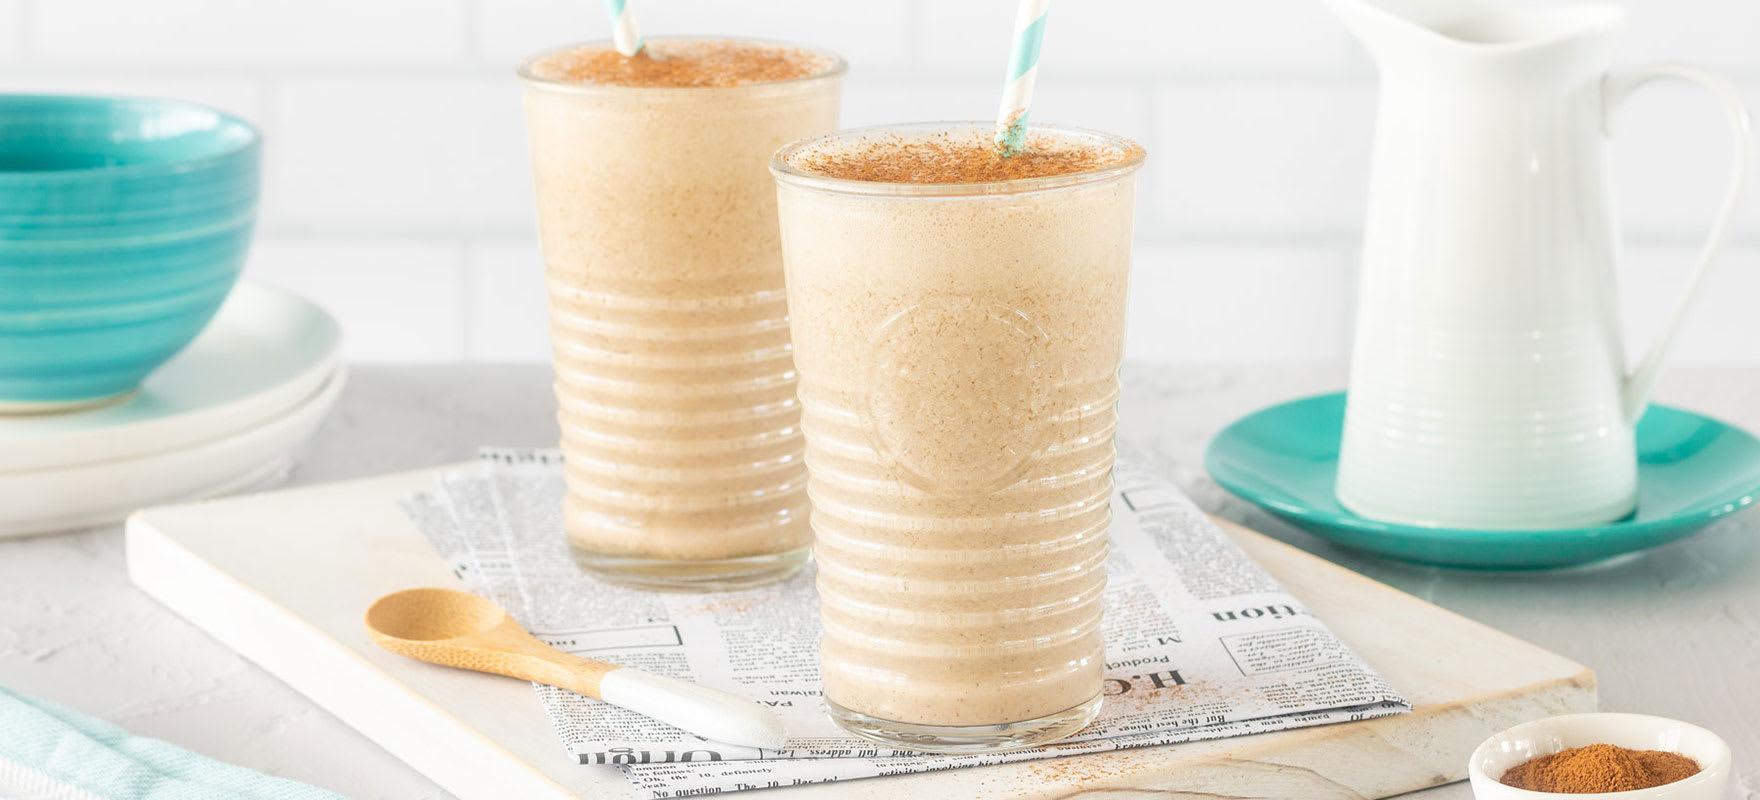 Vanilla chai milkshake image 2